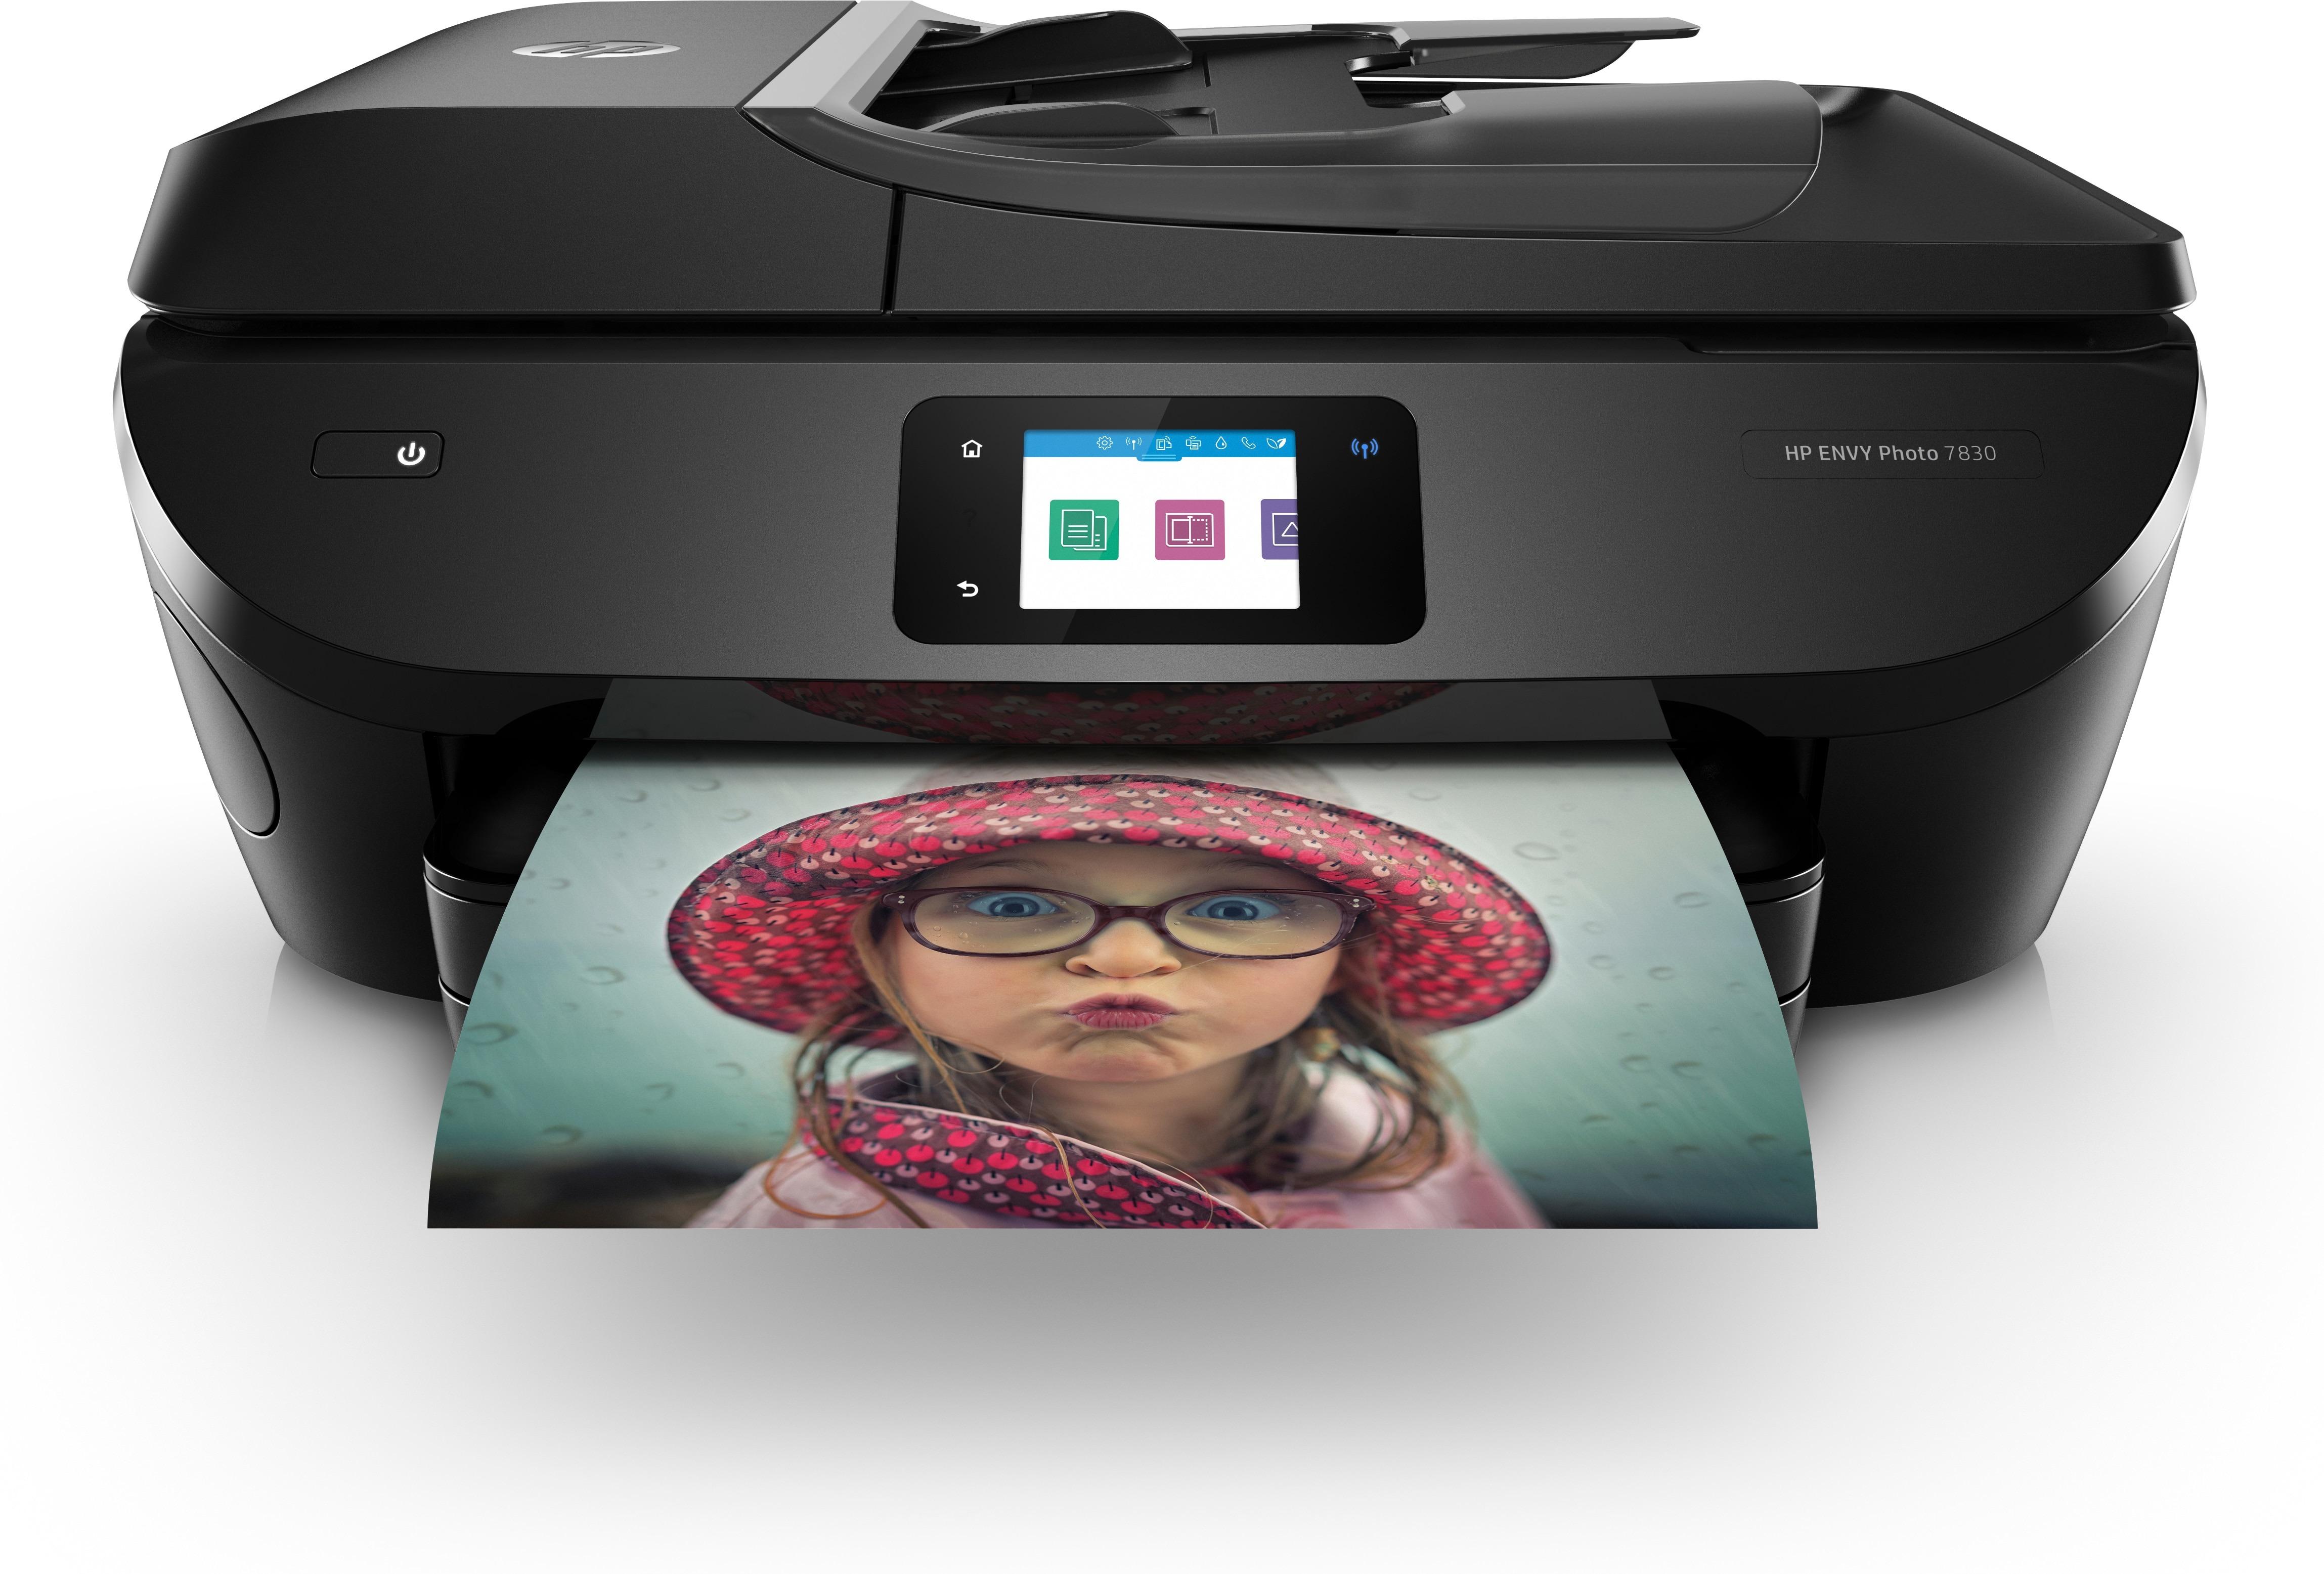 HP all in one inkjet printer ENVY PHOTO 7830